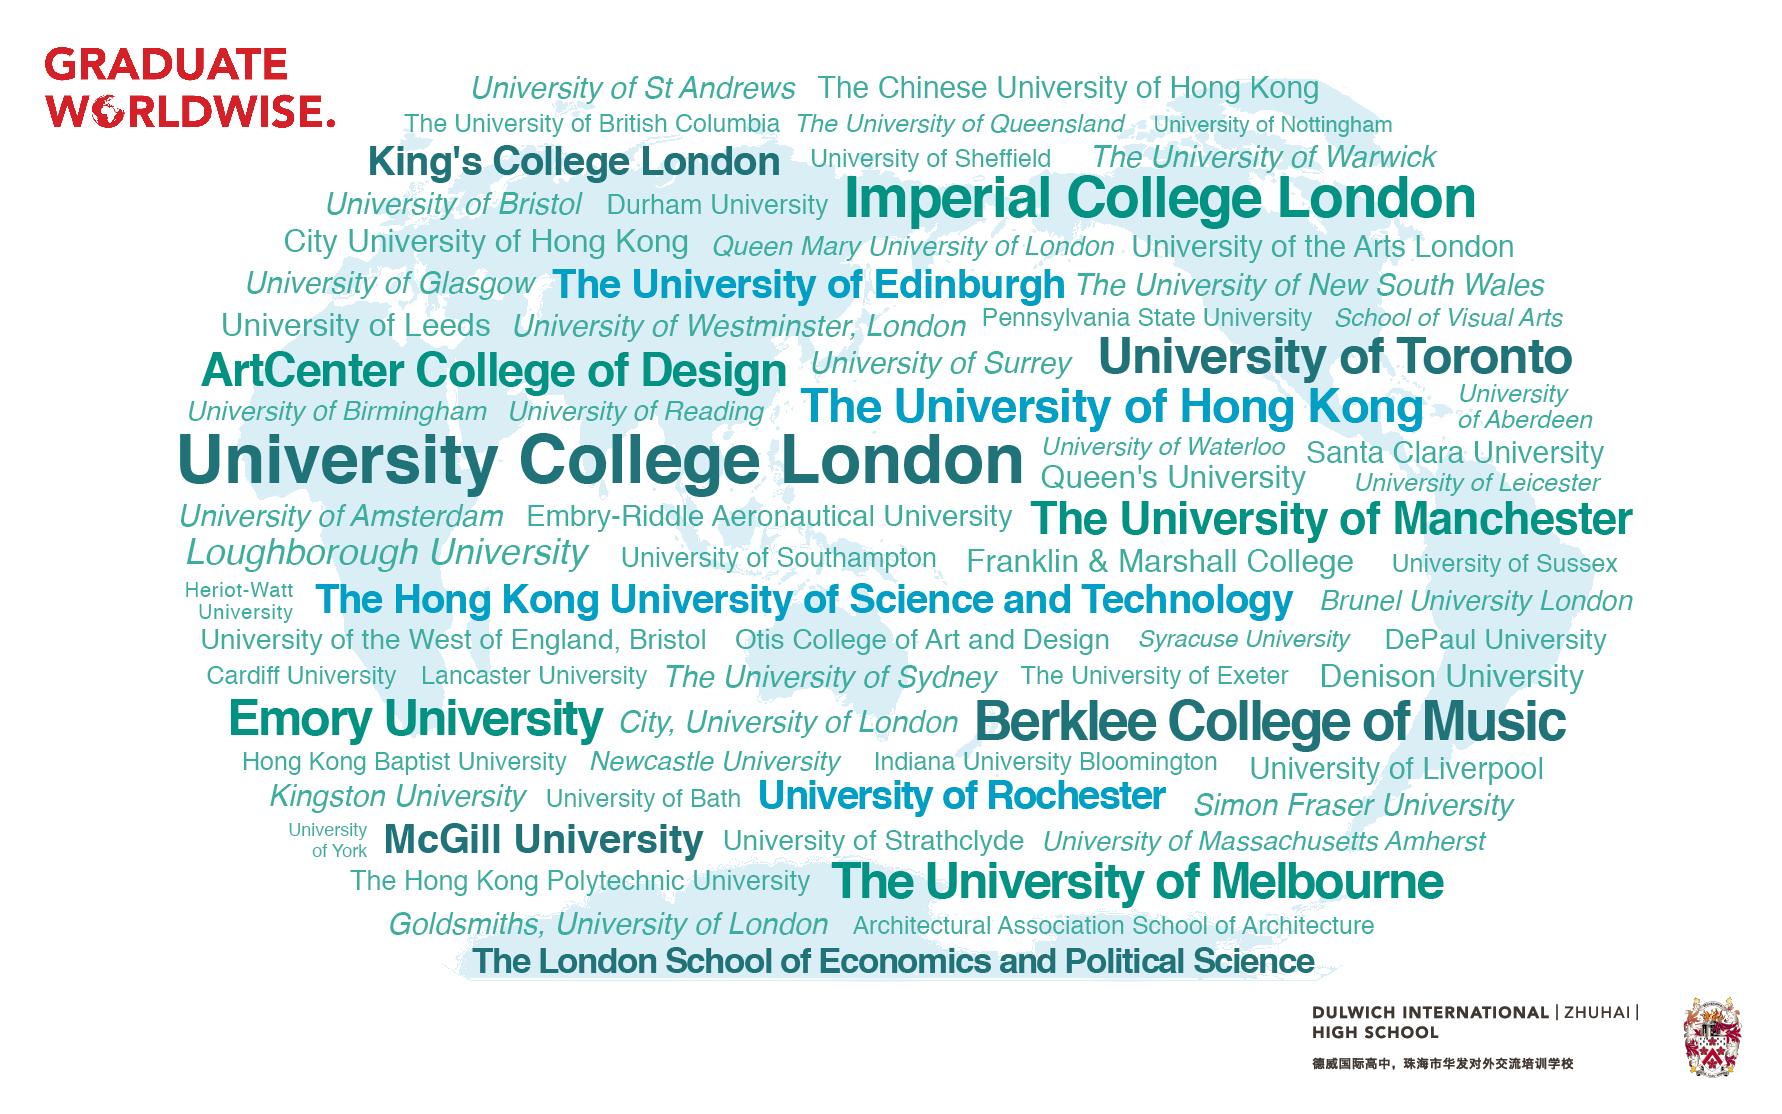 university-offer-pic-珠海德威国际高中-20200529-114418-347